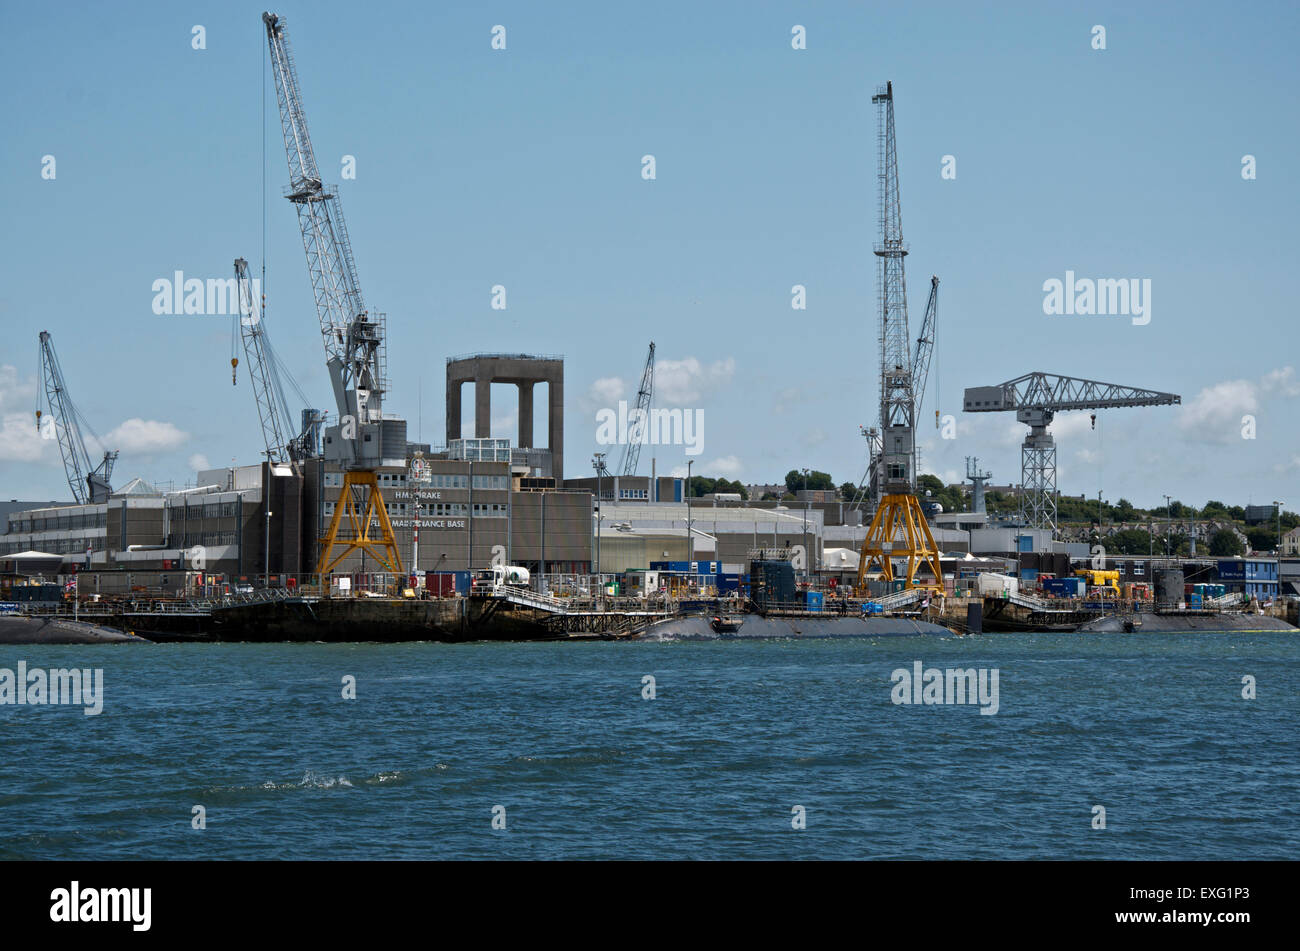 HMNB Devonport Royal Navy maintenance depot at HMS Drake, Plymouth, UK - Stock Image